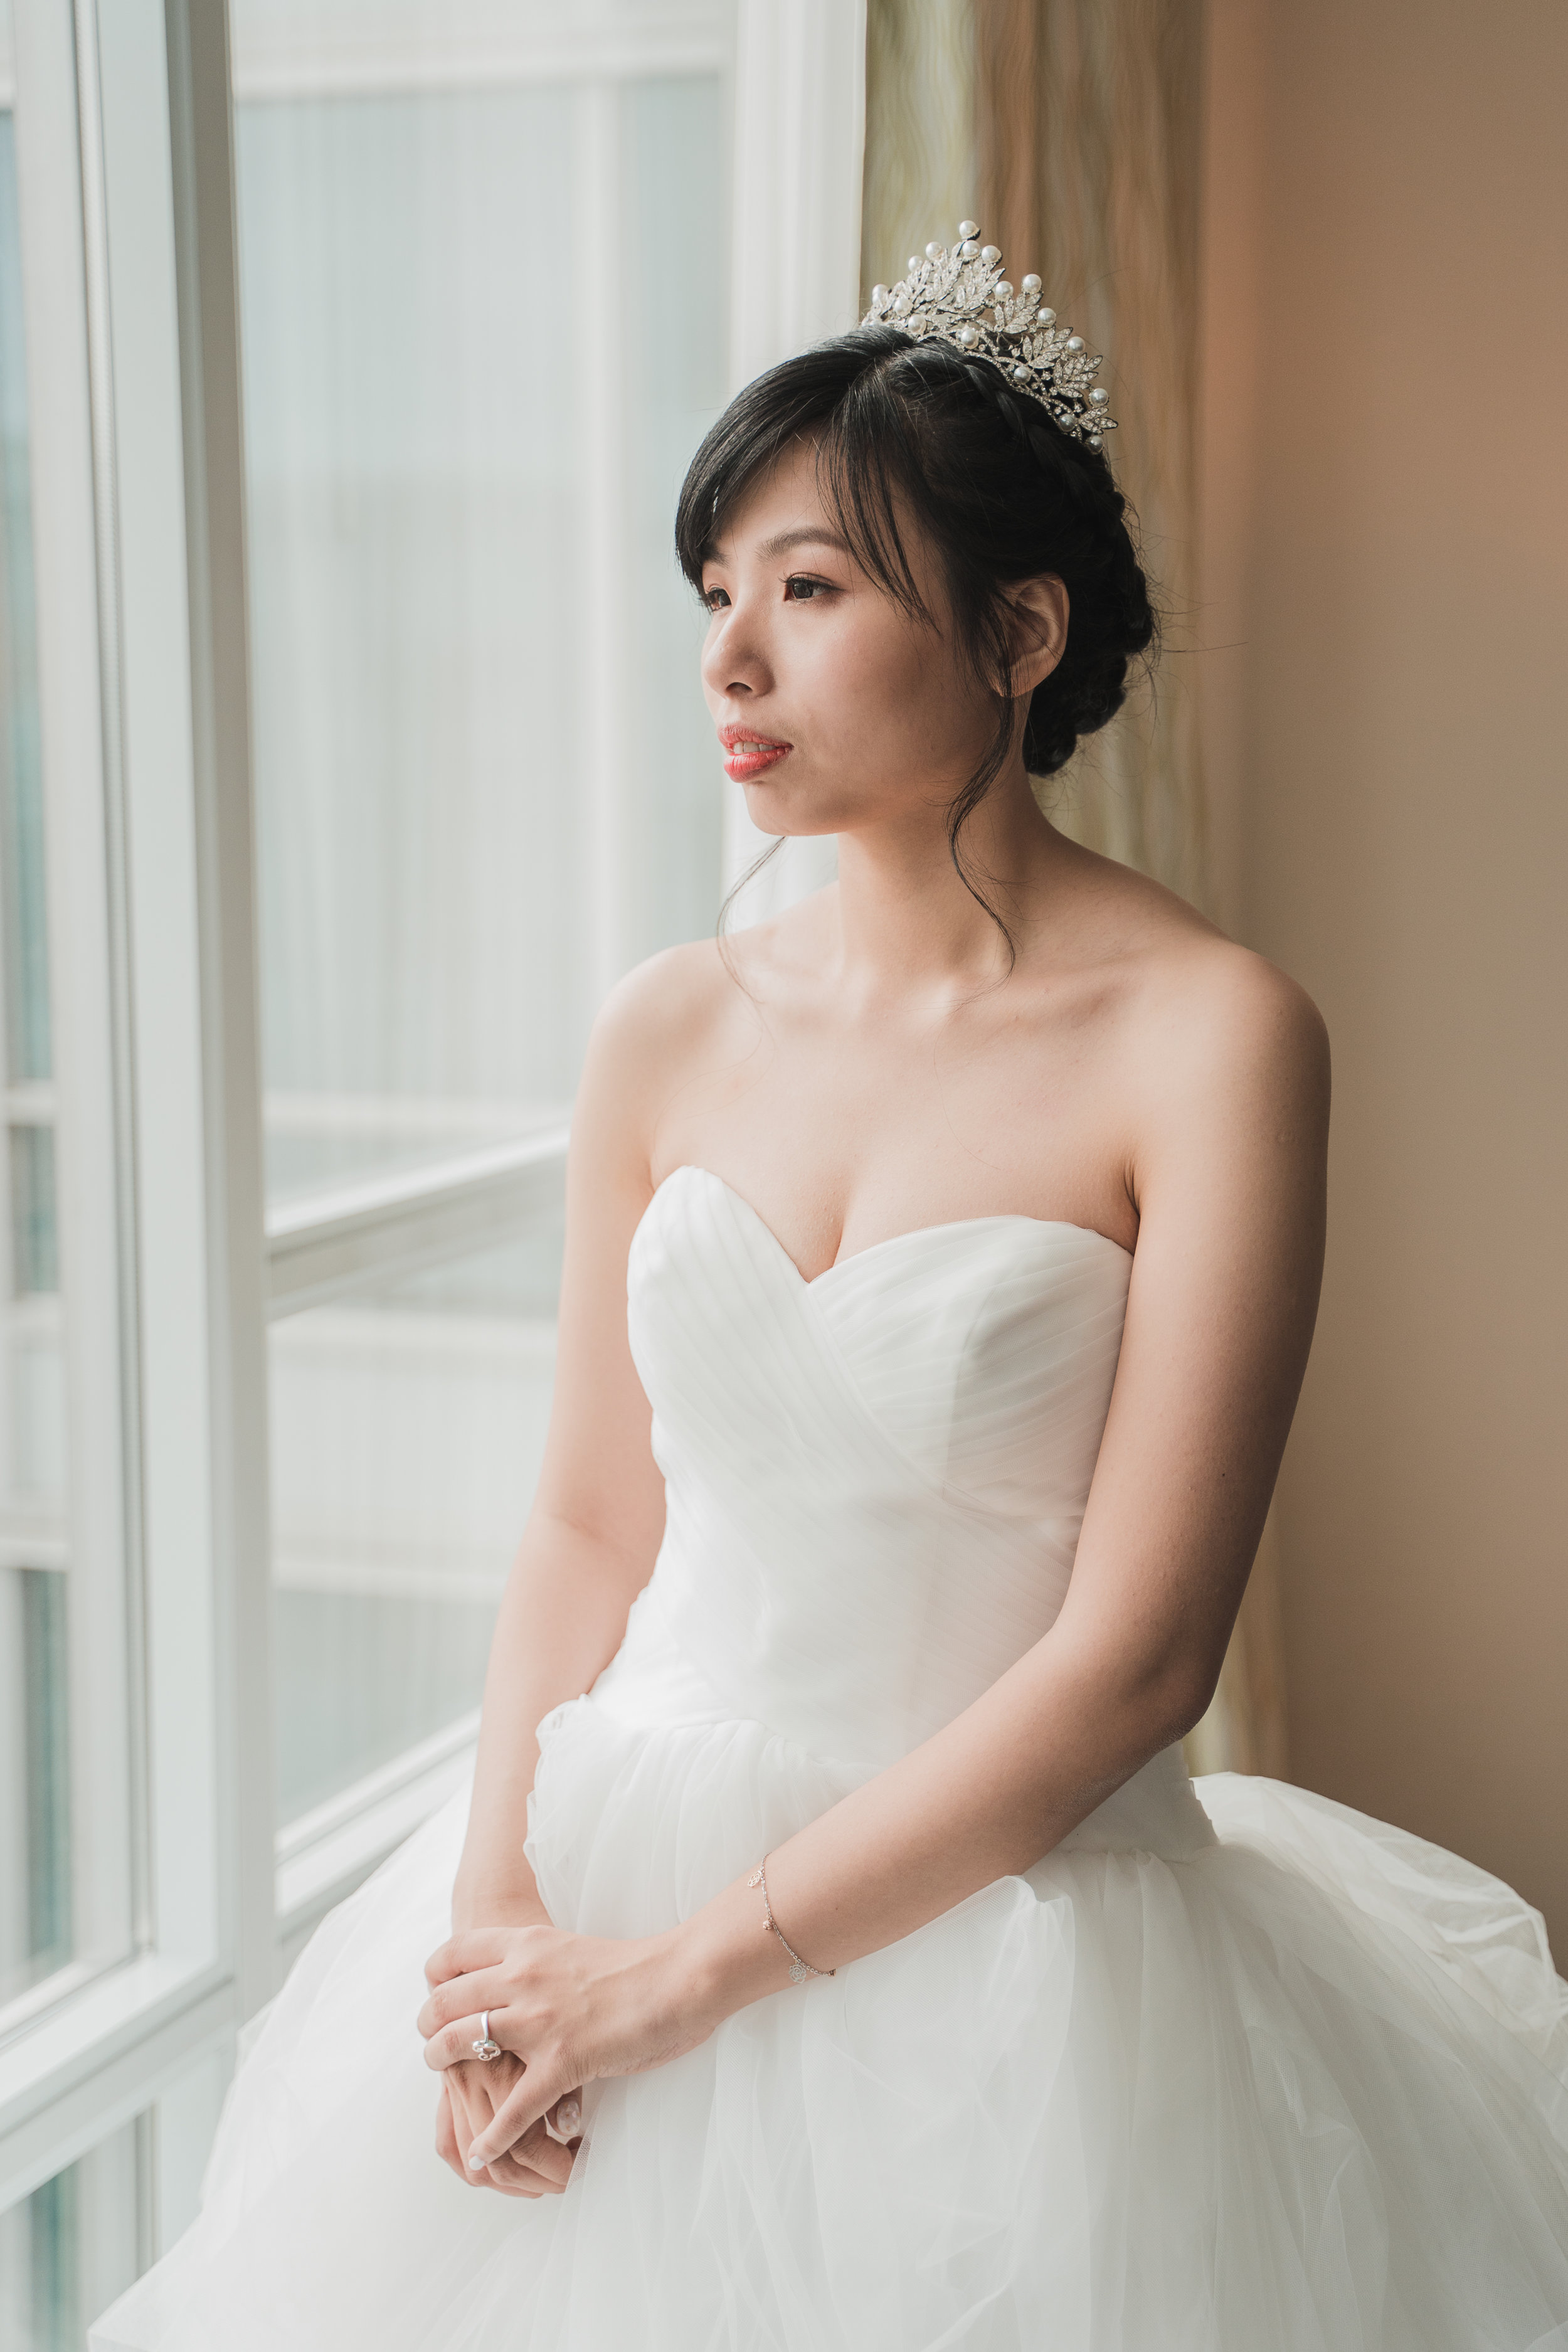 20190520 - Pamela & Matthew Wedding - 0045.jpg